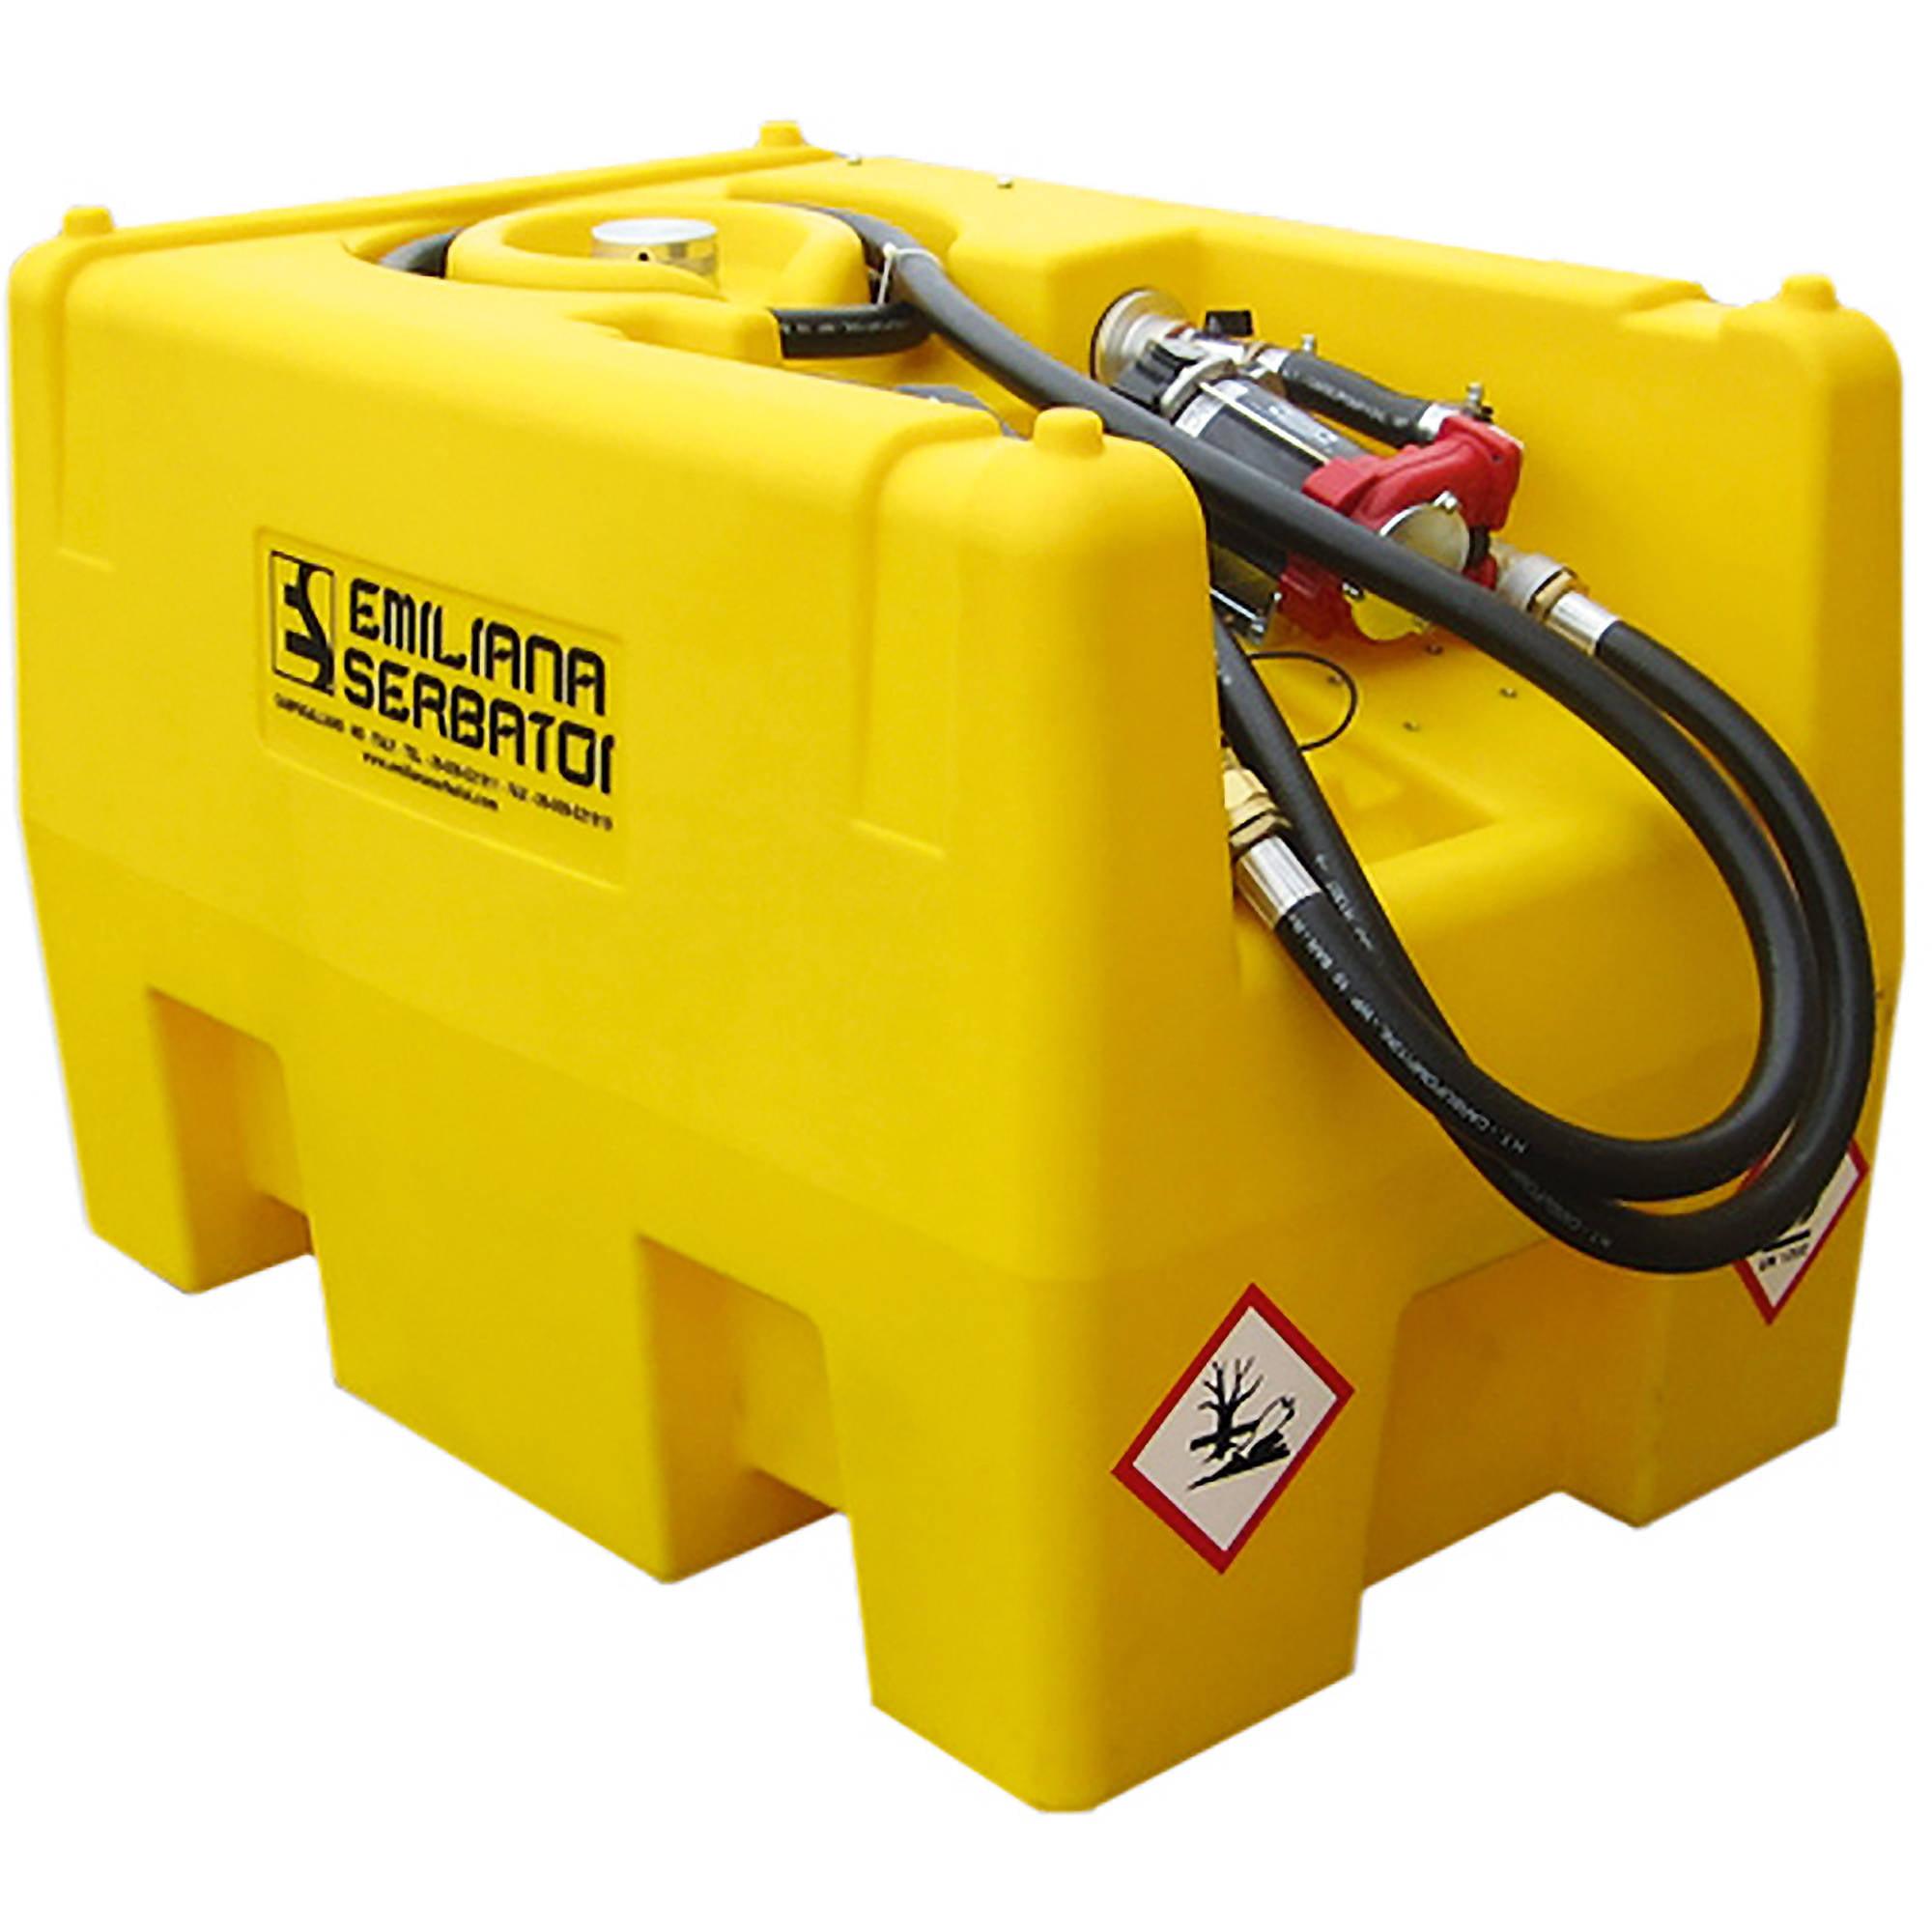 Emiliana Serbatoi Portable Diesel Tank, 58-gallons